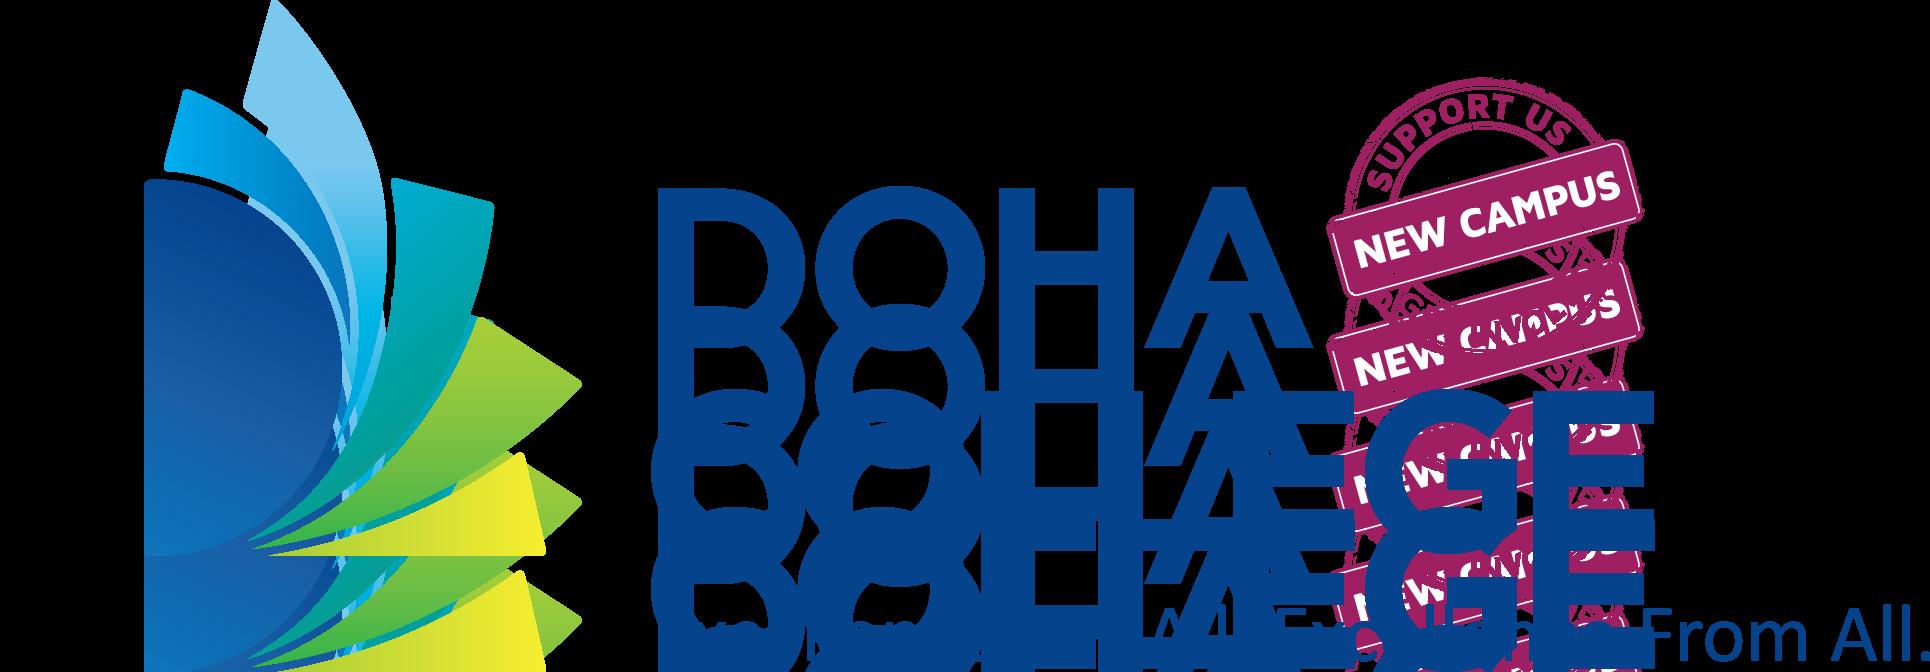 Doha College Logo